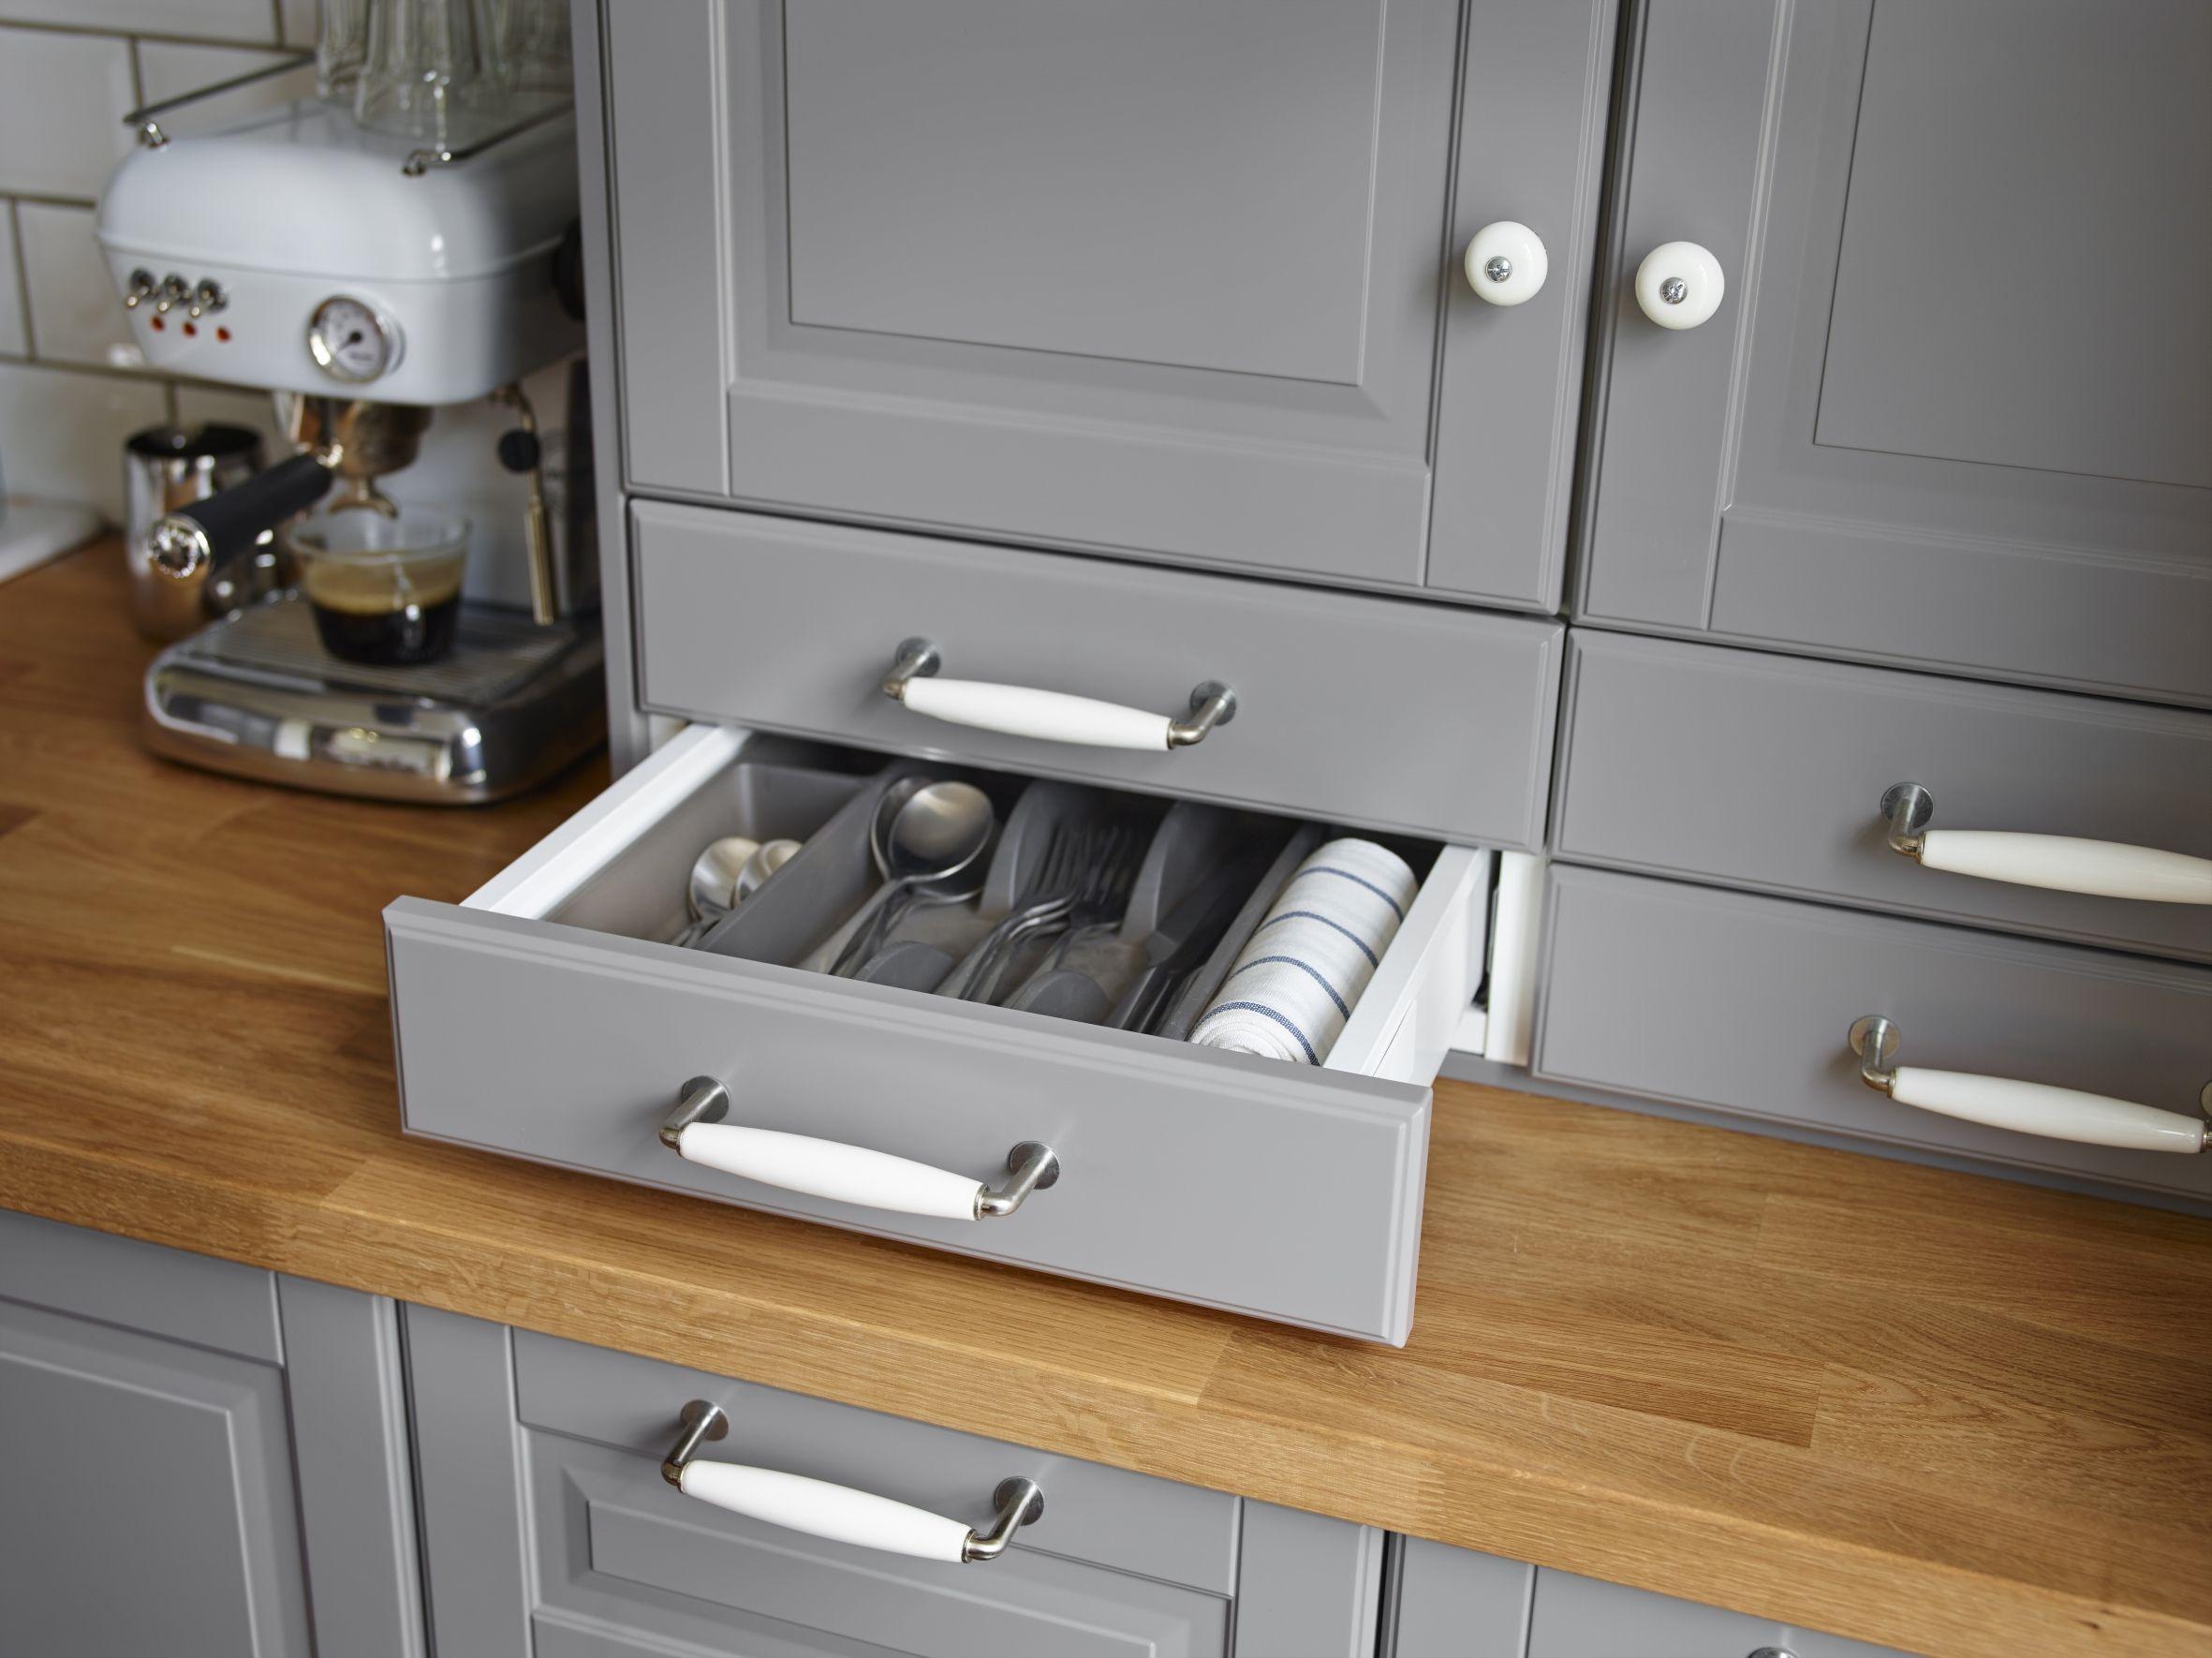 Geef je fantasie de ruimte met ons nieuwe metod keukensysteem